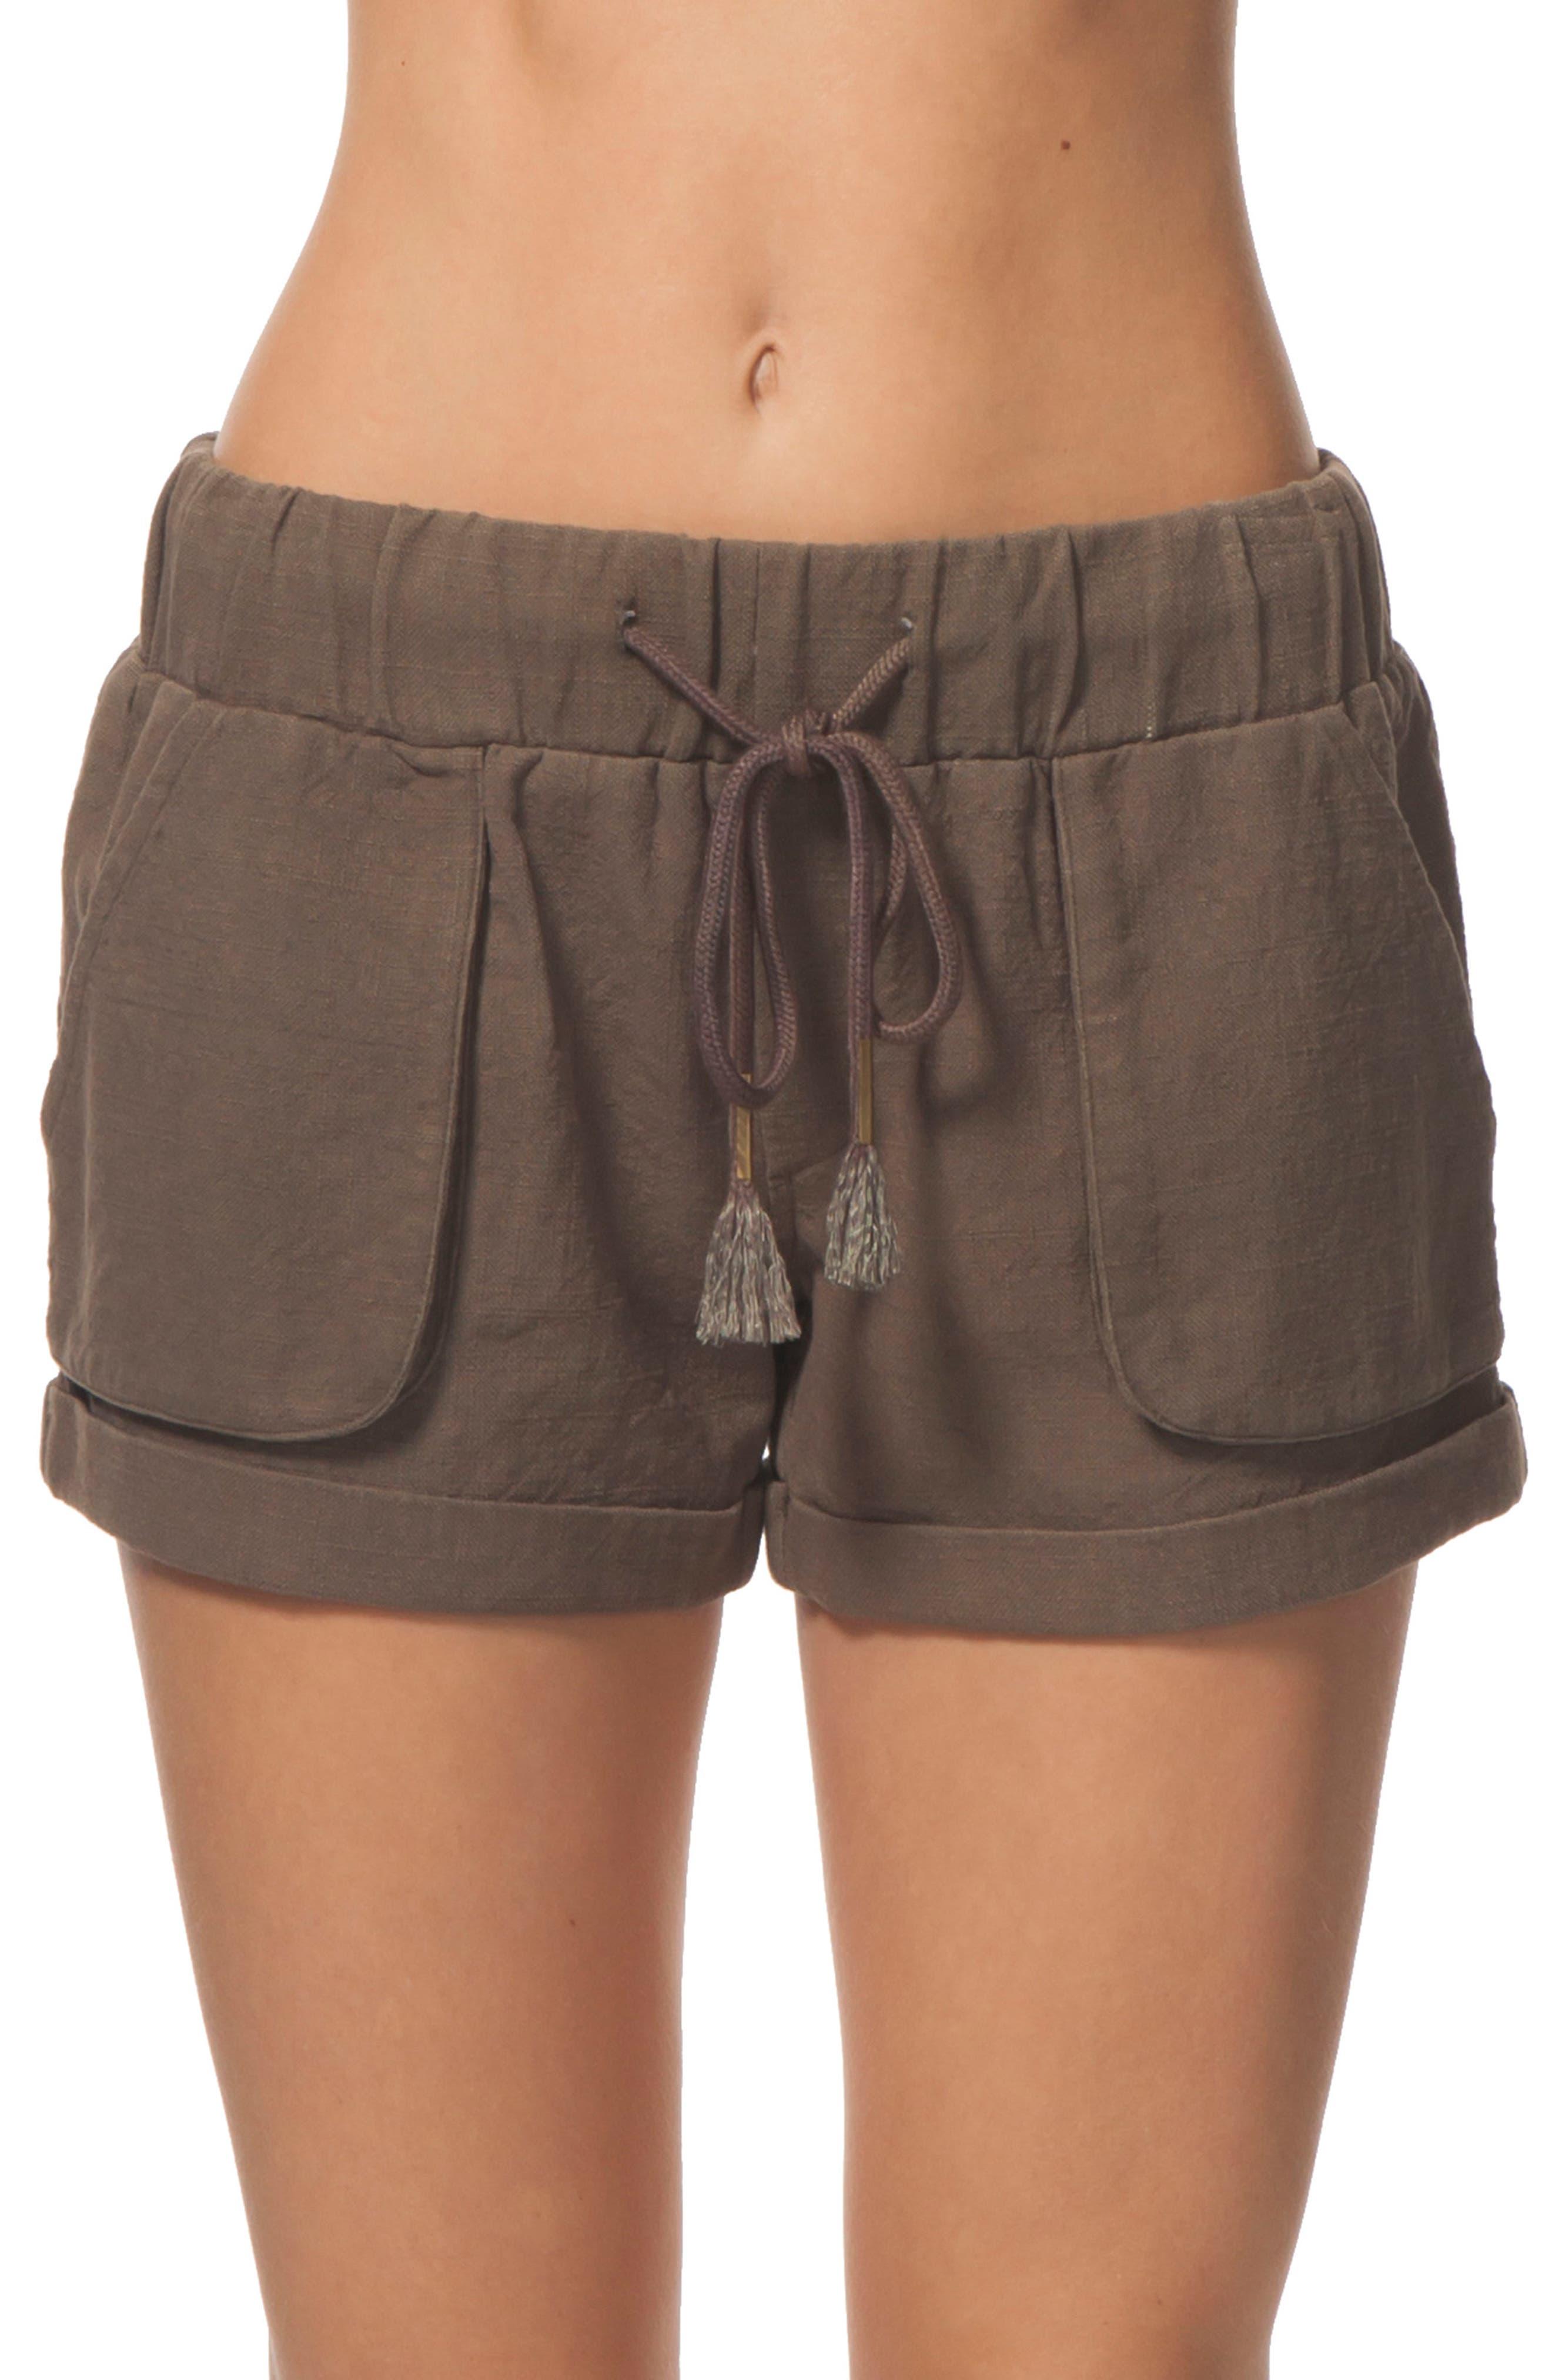 Tumbleweed Cotton Shorts,                             Alternate thumbnail 2, color,                             Army